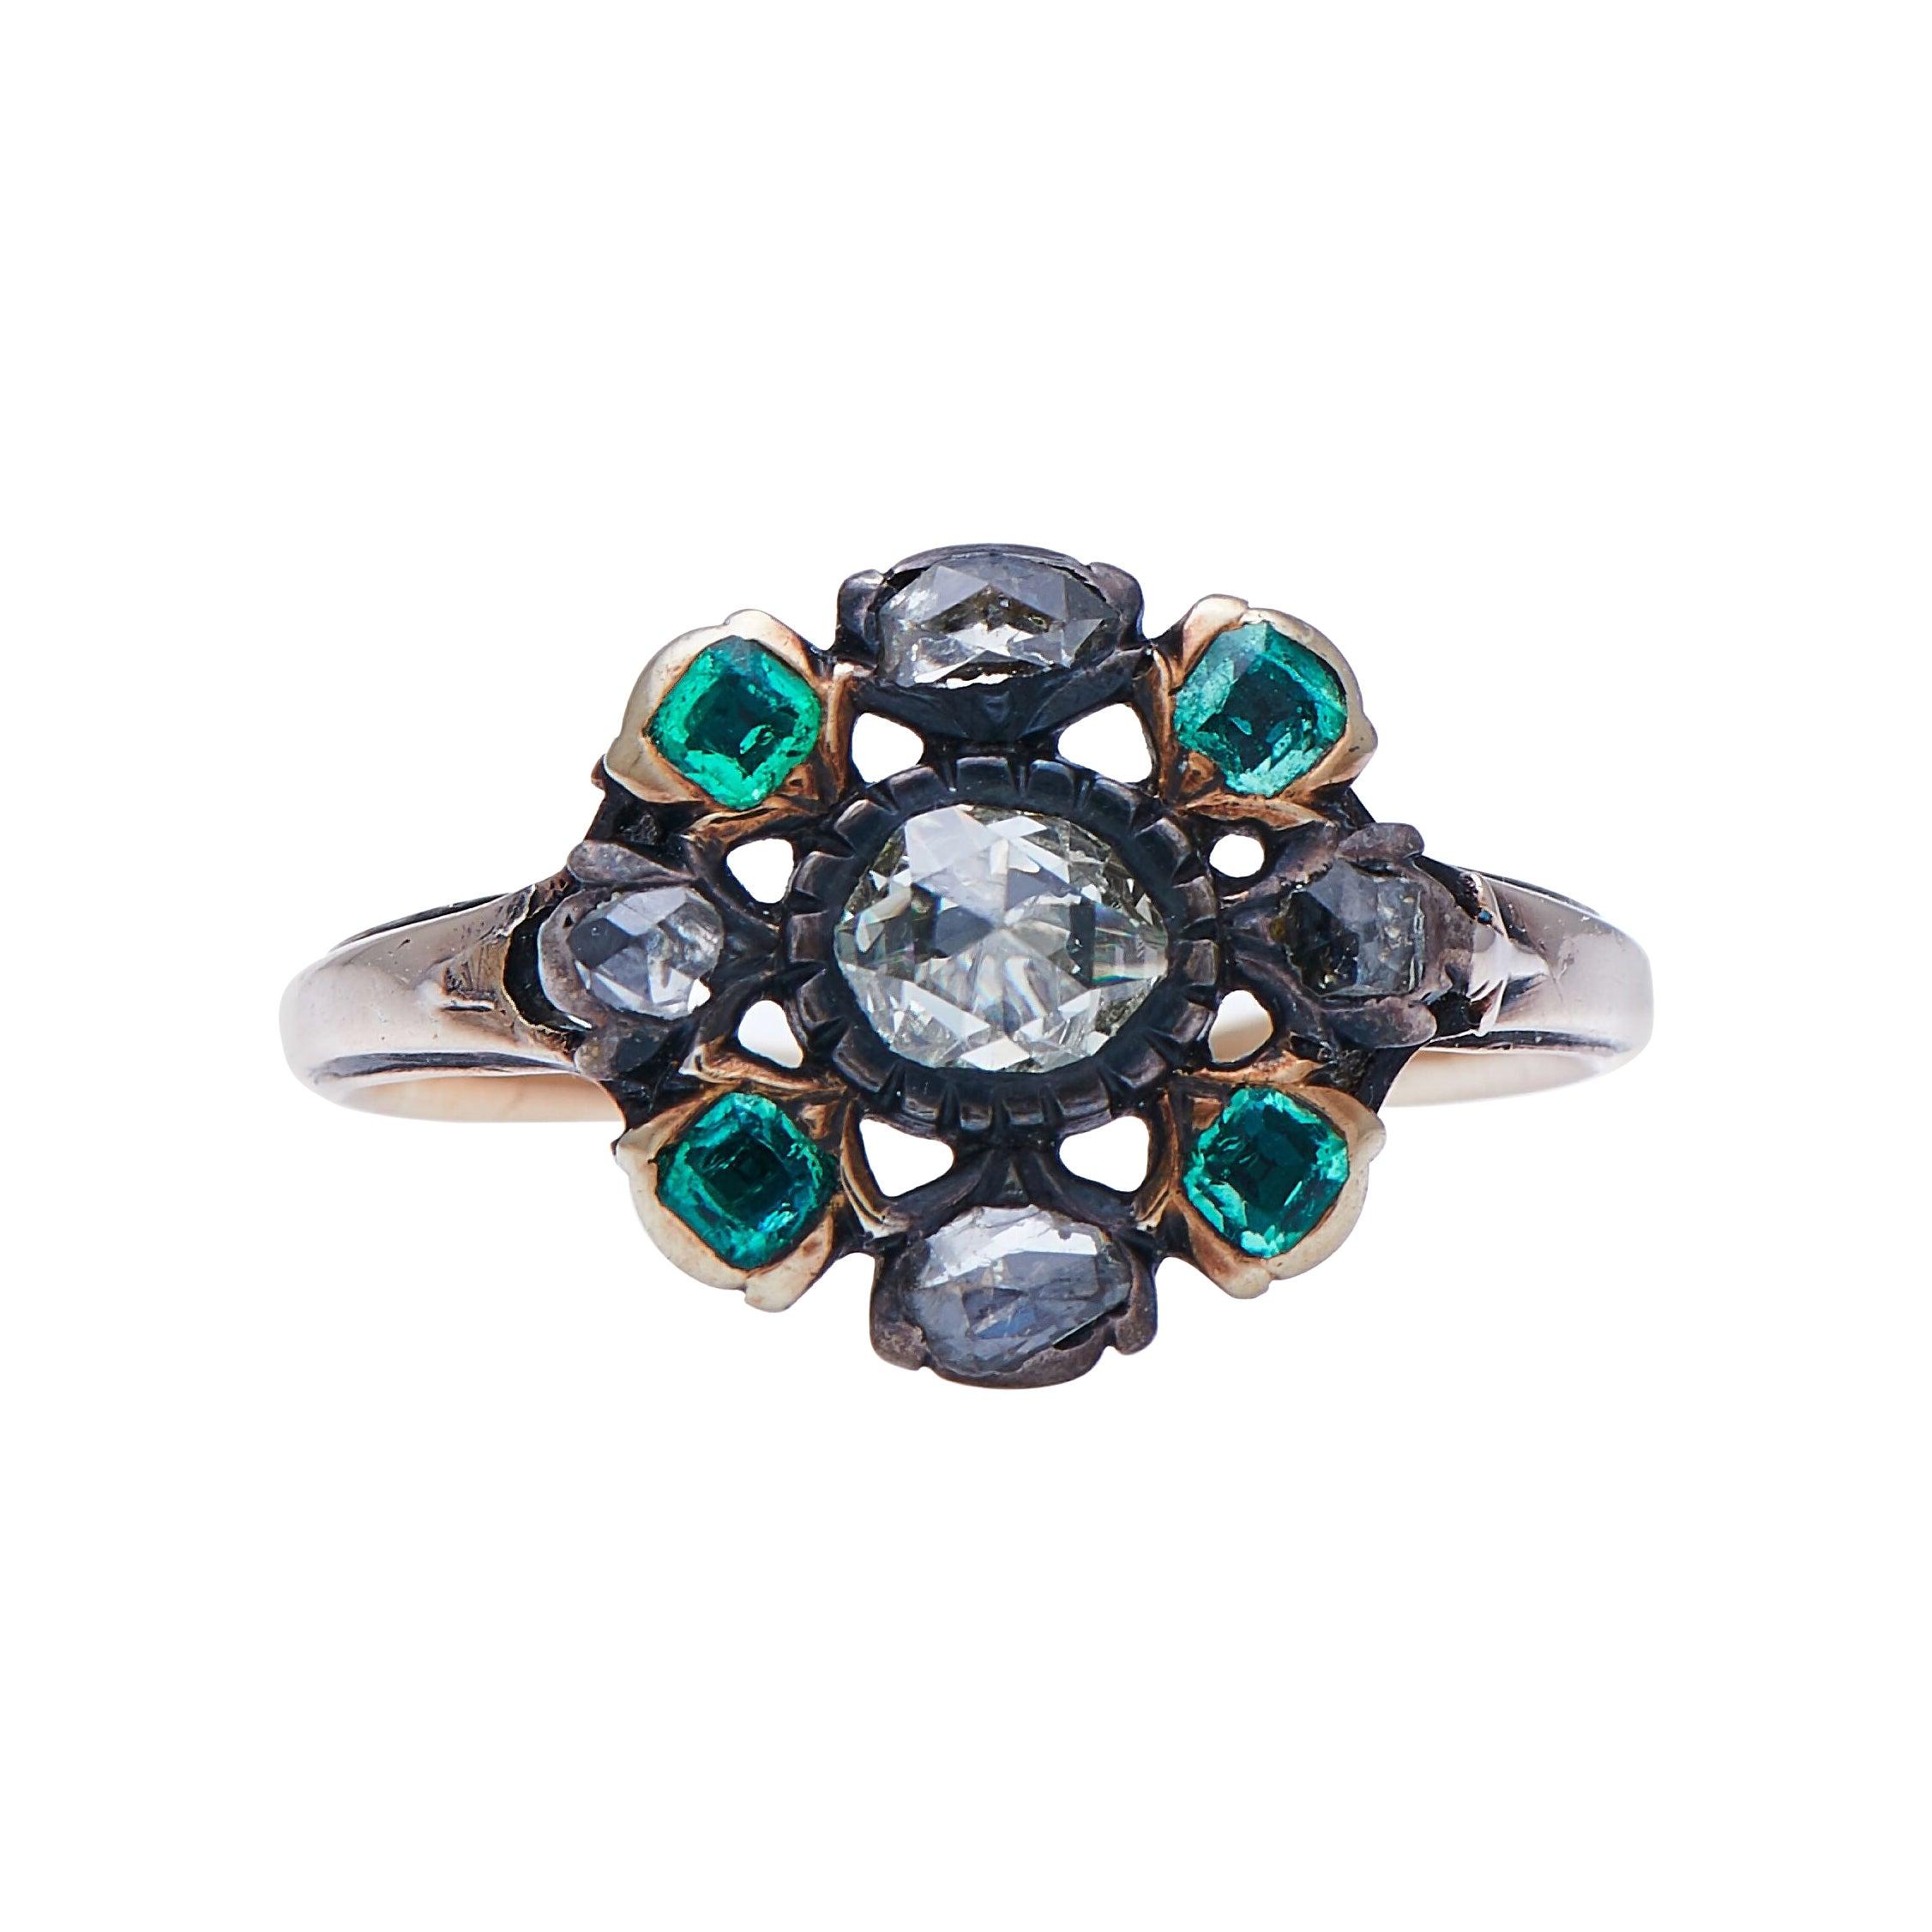 Antique Georgian, 18th Century, 18 Carat Gold, Emerald and Diamond Cluster Ring